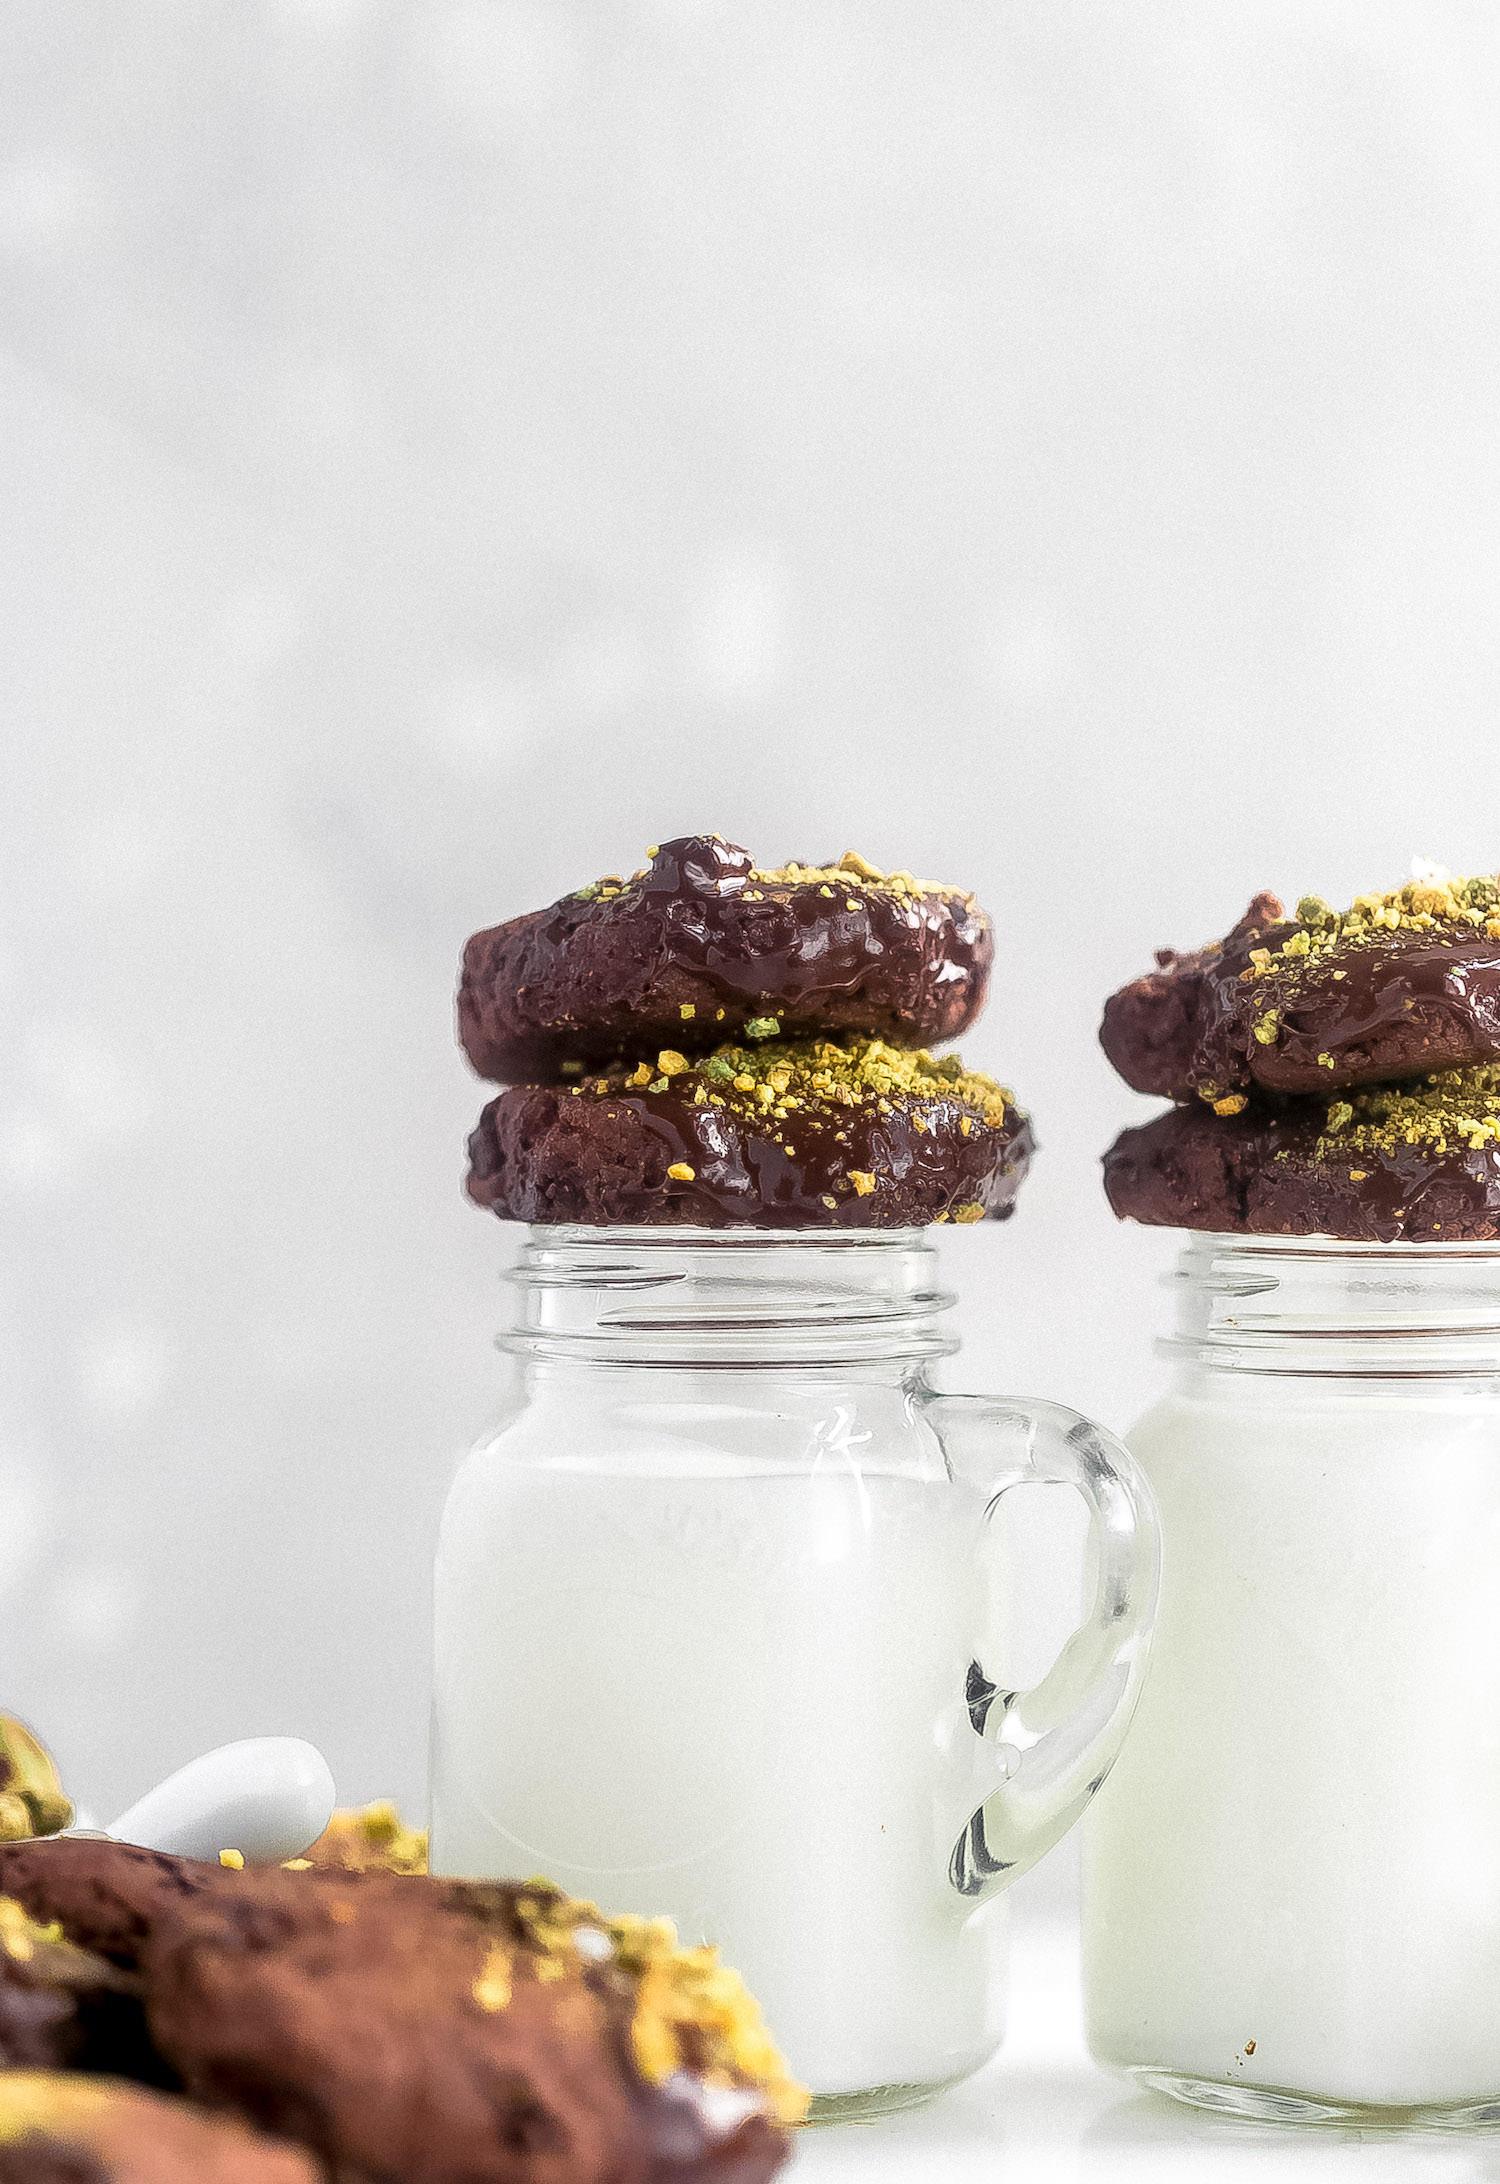 Double Chocolate Pistachio Shortbread Cookies: tender, crispy, rich chocolate shortbread cookies with chocolate shards and a melted chocolate, chopped pistachio garnish.   TrufflesandTrends.com